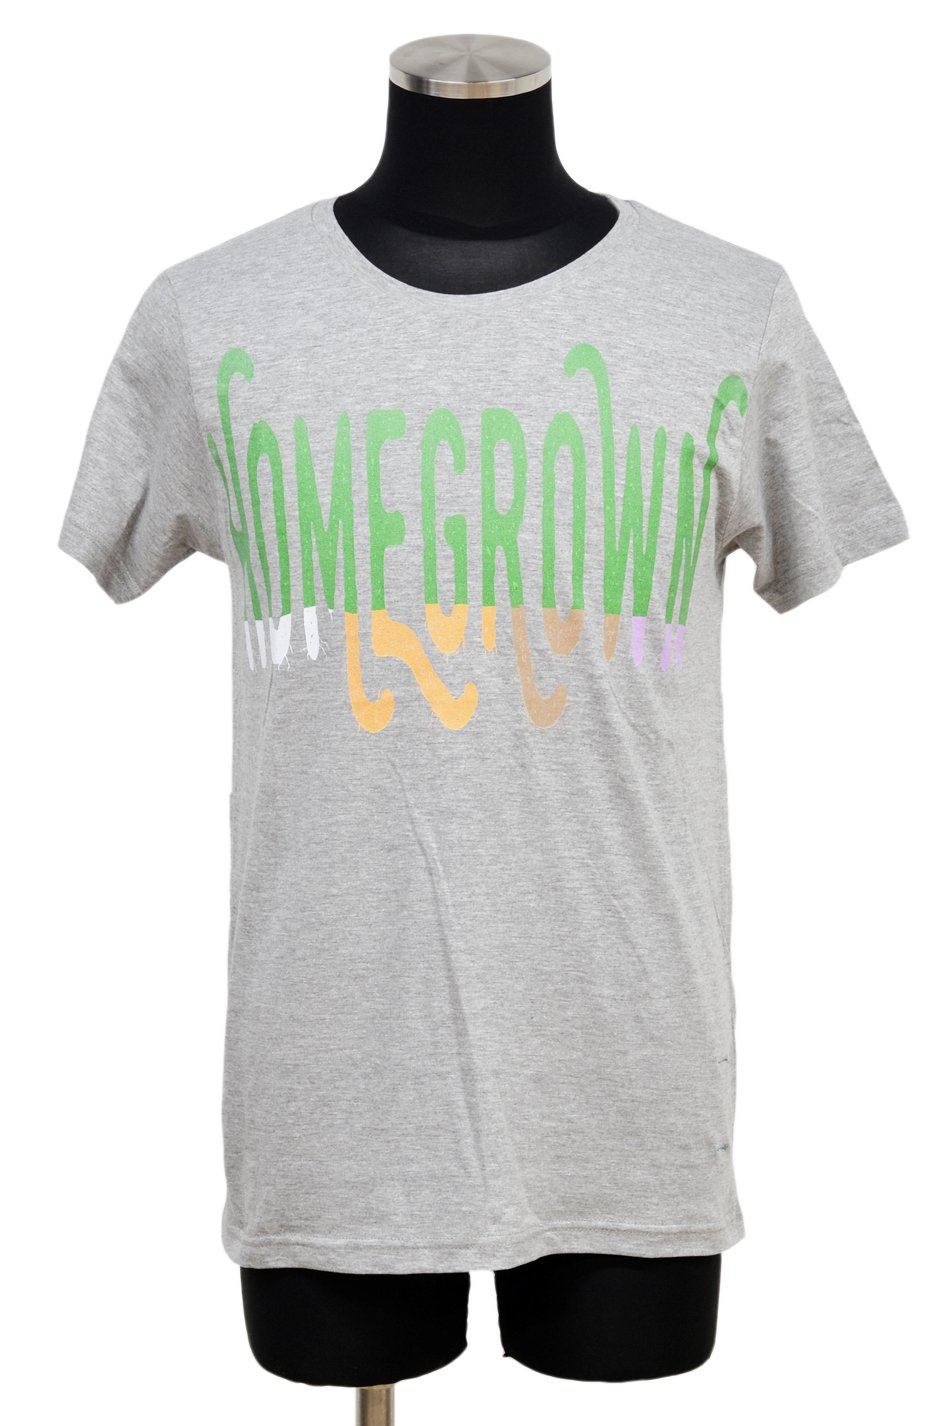 40%off! ARIGATO FAKKYU - アリガトファッキュ HOMEGROWN T-Shirt / Heather Gray